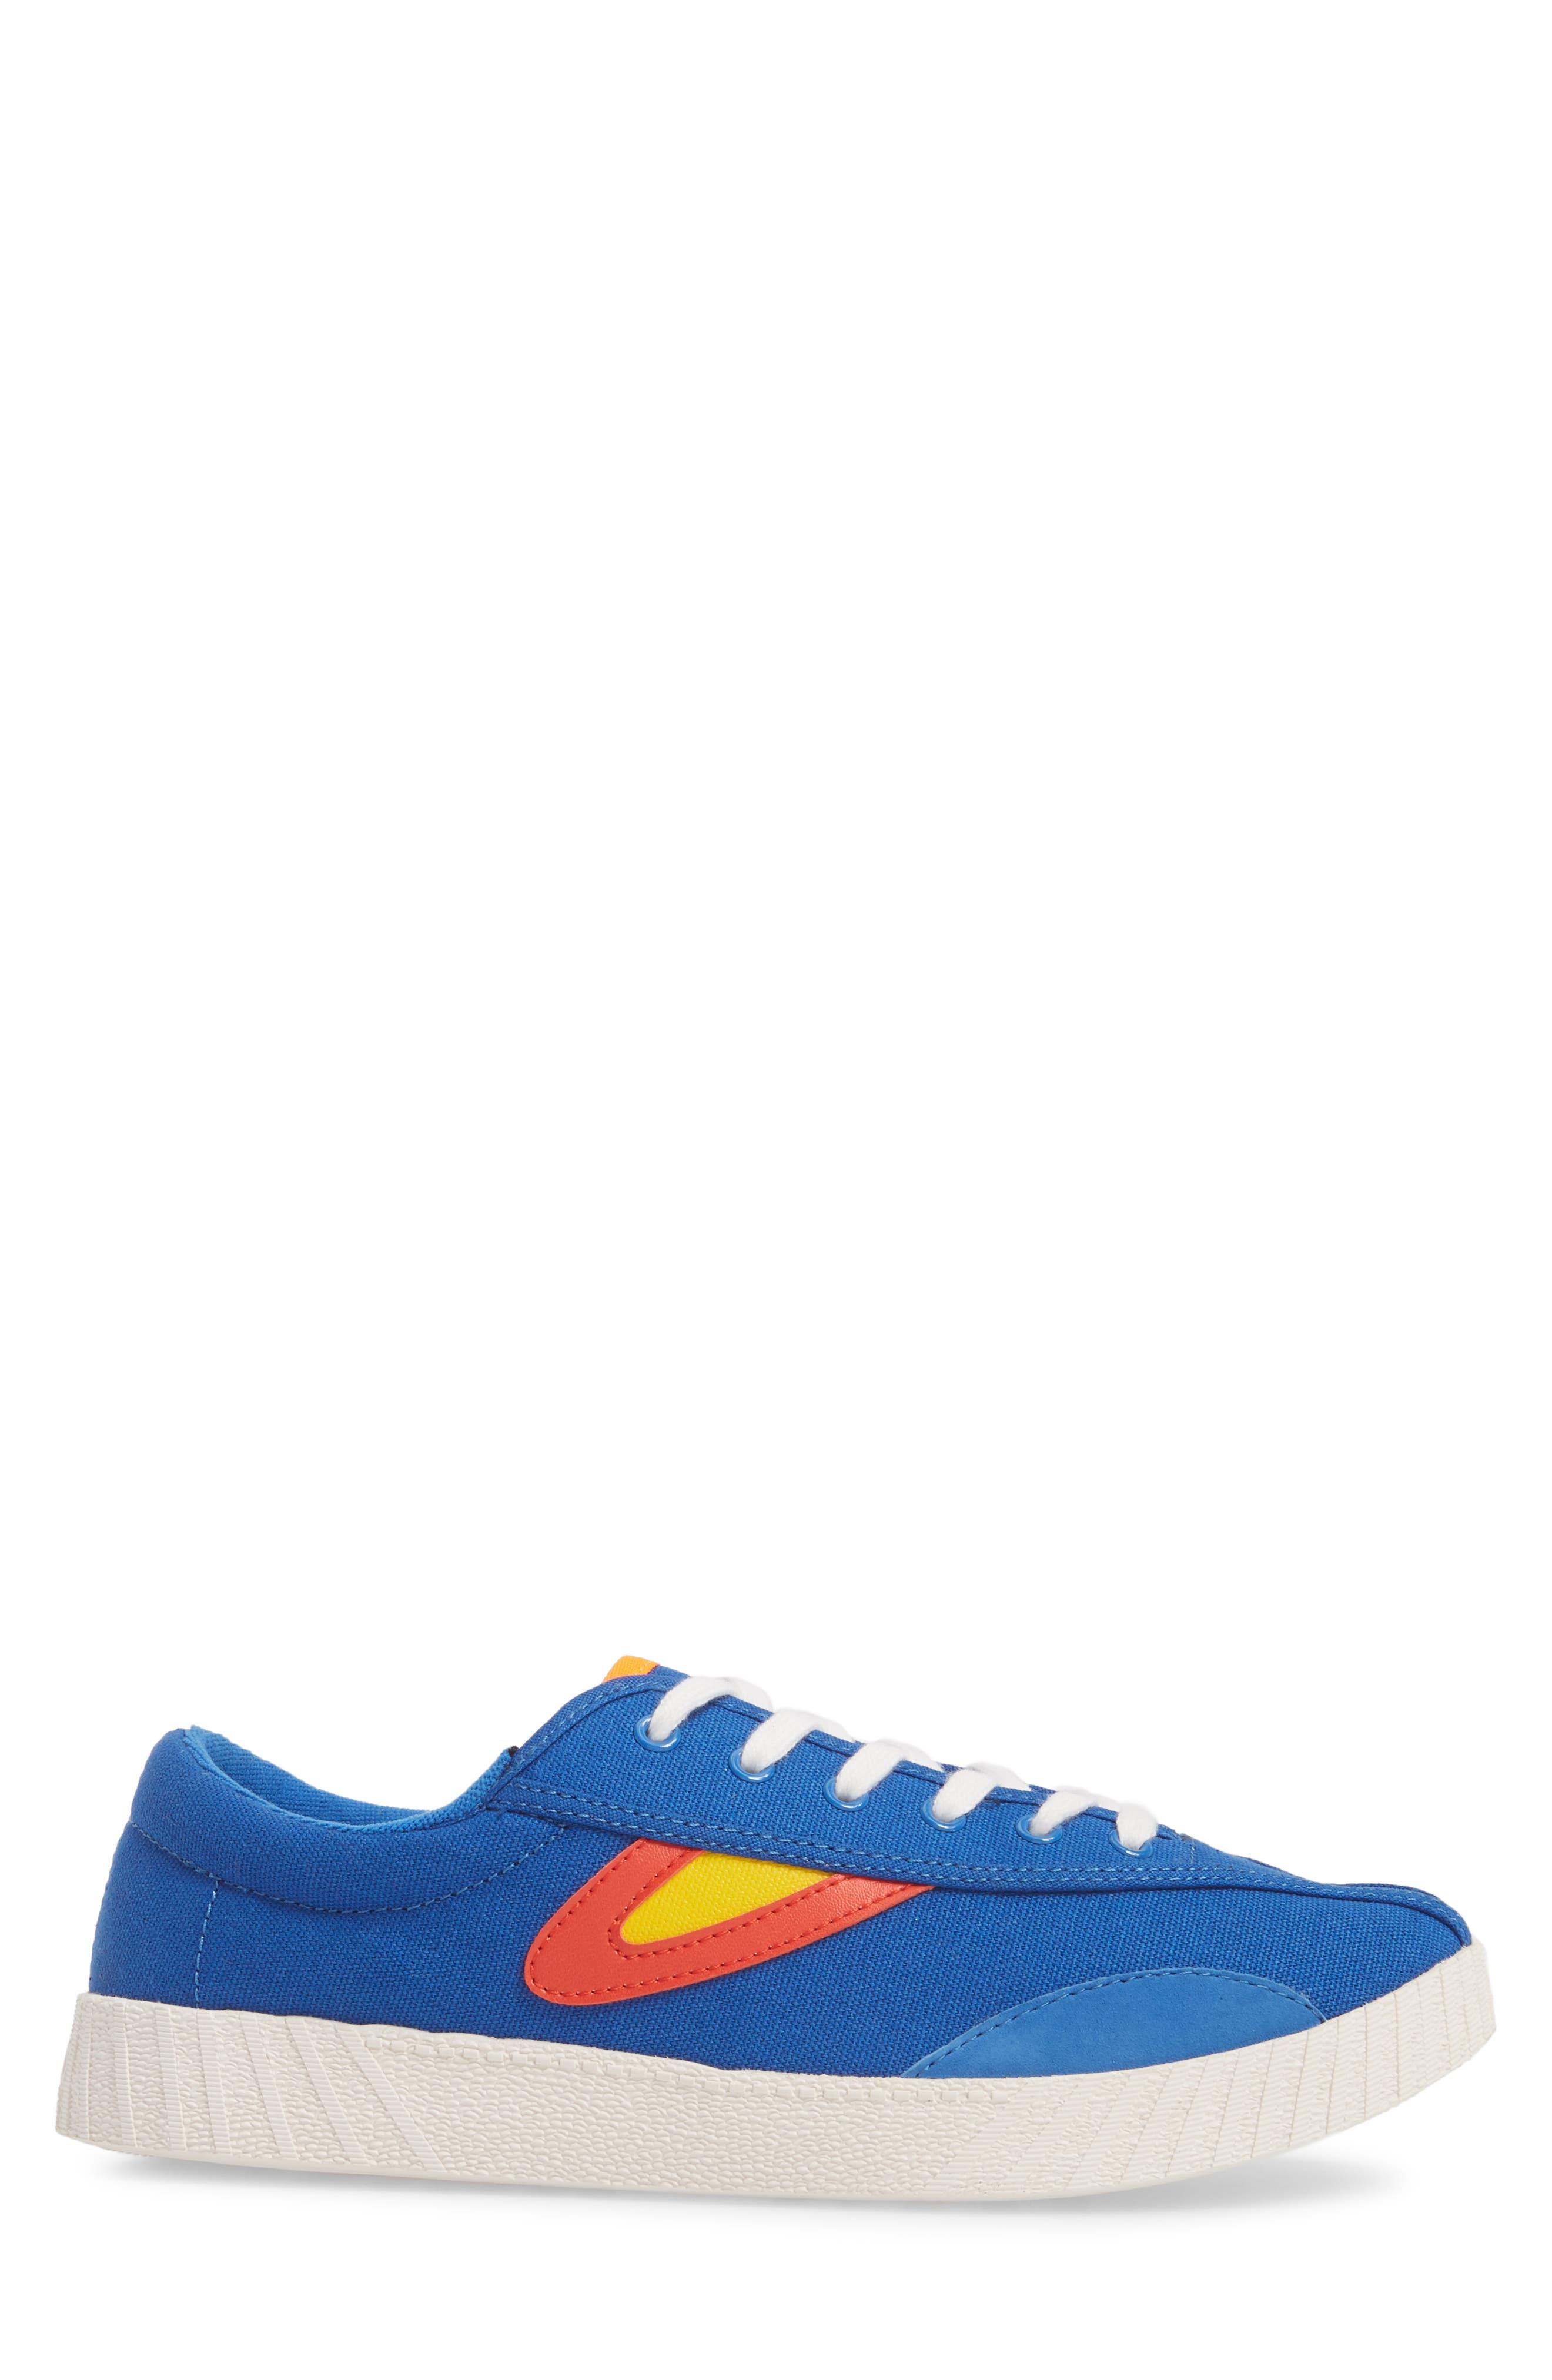 Alternate Image 3  - Tretorn Andre 3000 Nylite Low Top Sneaker (Men)